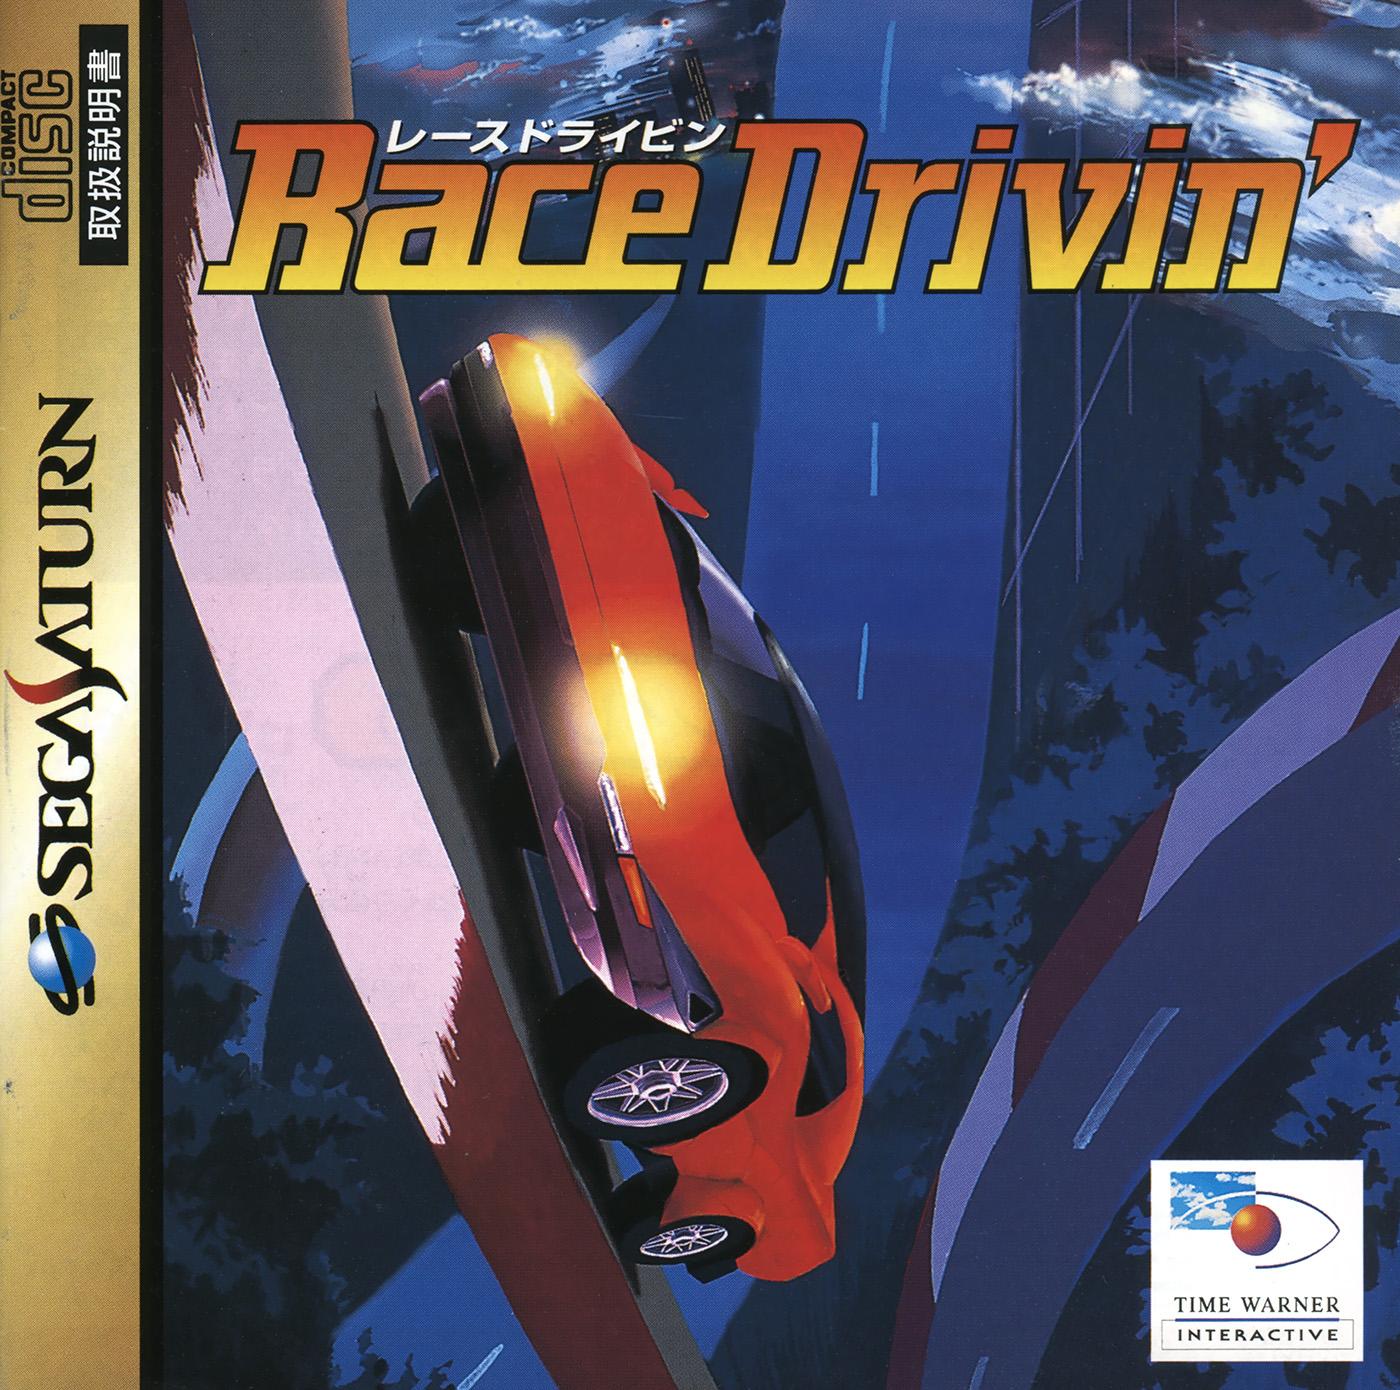 RaceDrivin_Saturn_JP_Box_Front